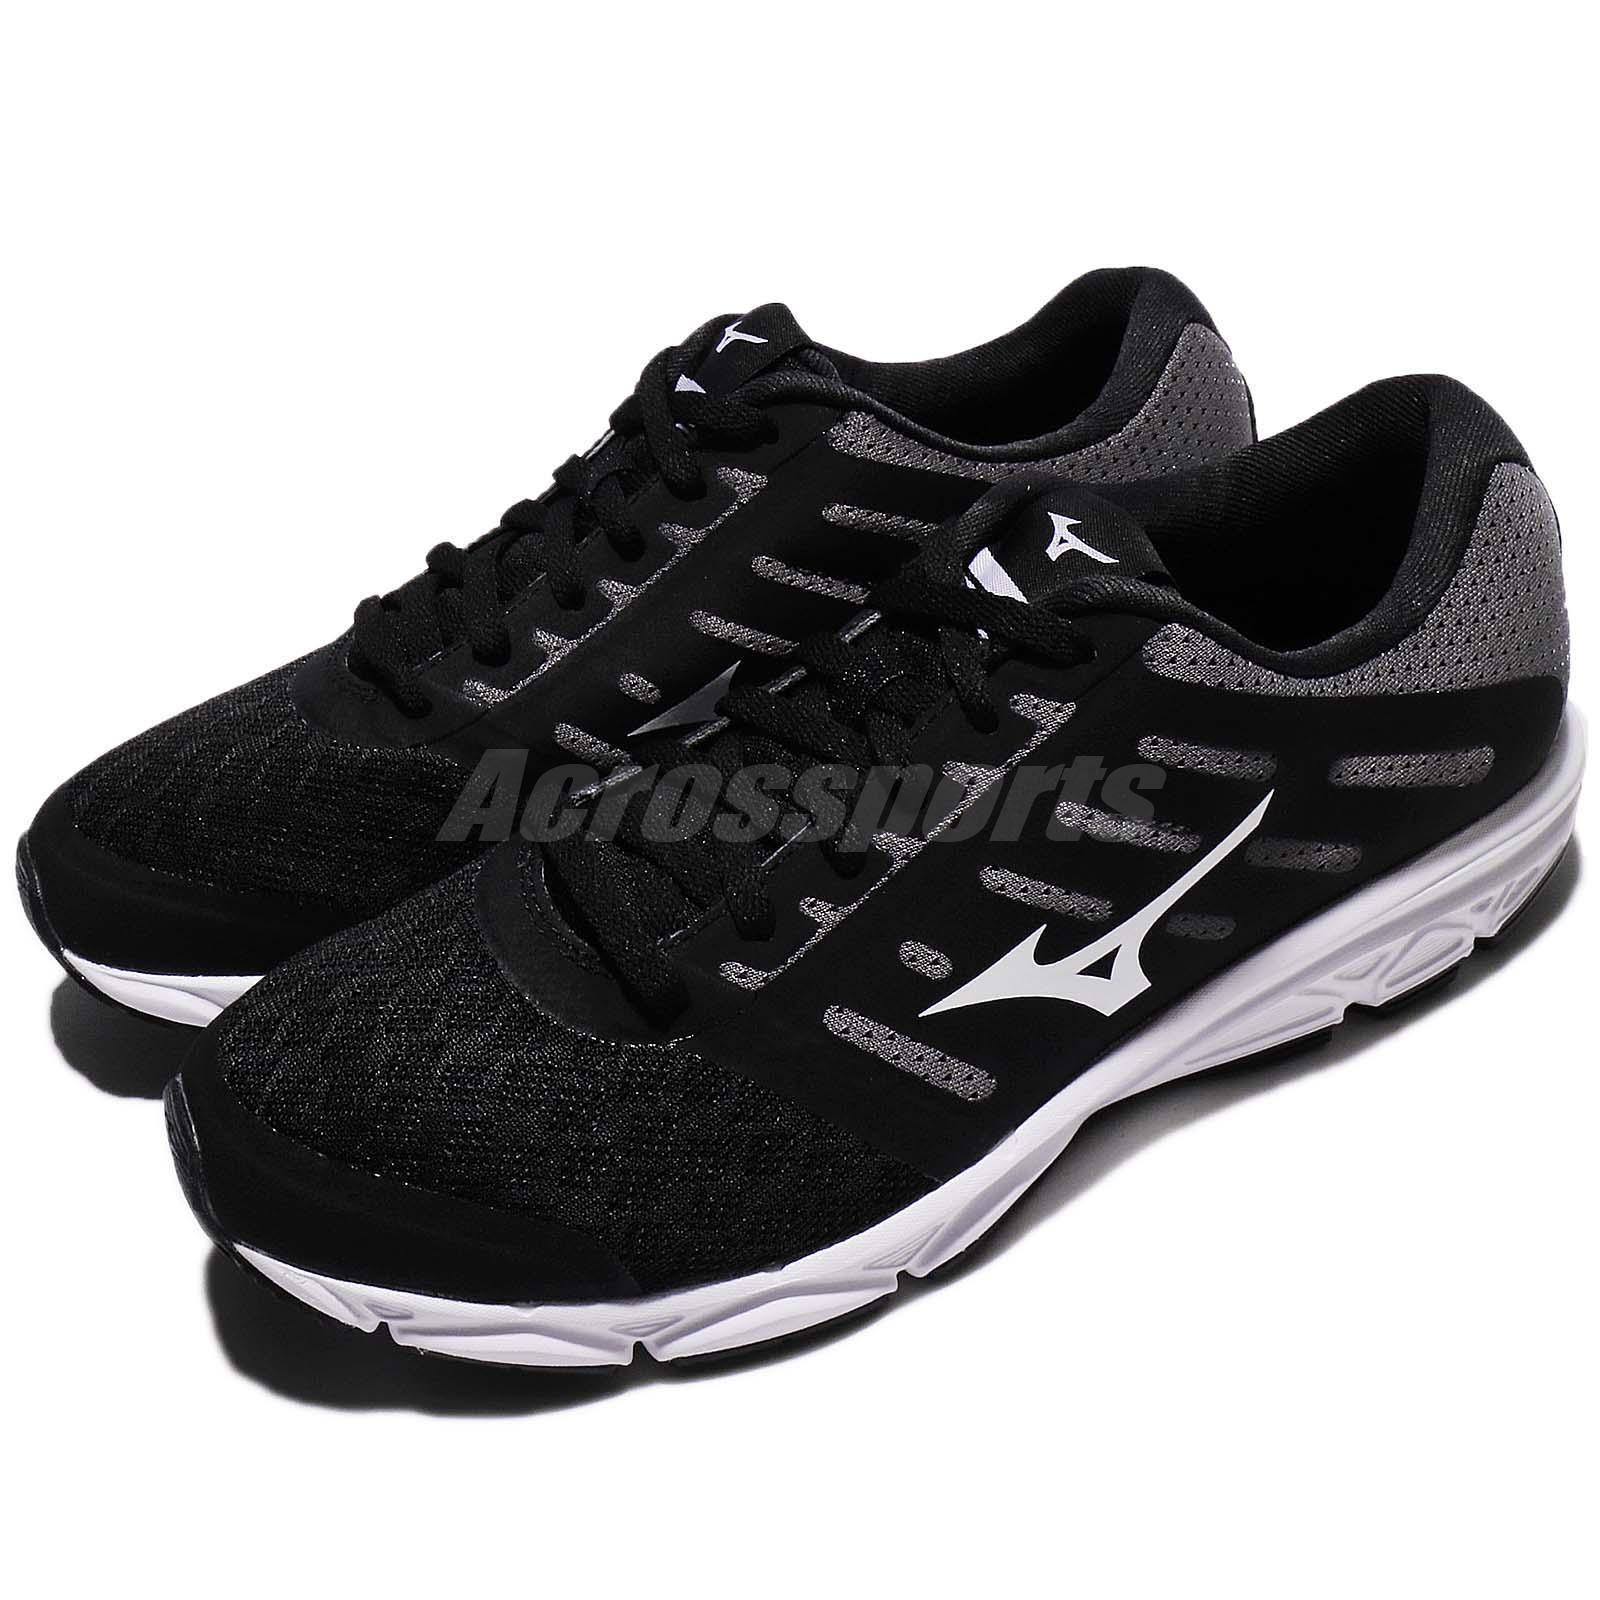 Mizuno Ezrun Run Noir Blanc Femme Running Chaussures Sneakers Trainers J1GF18-3801